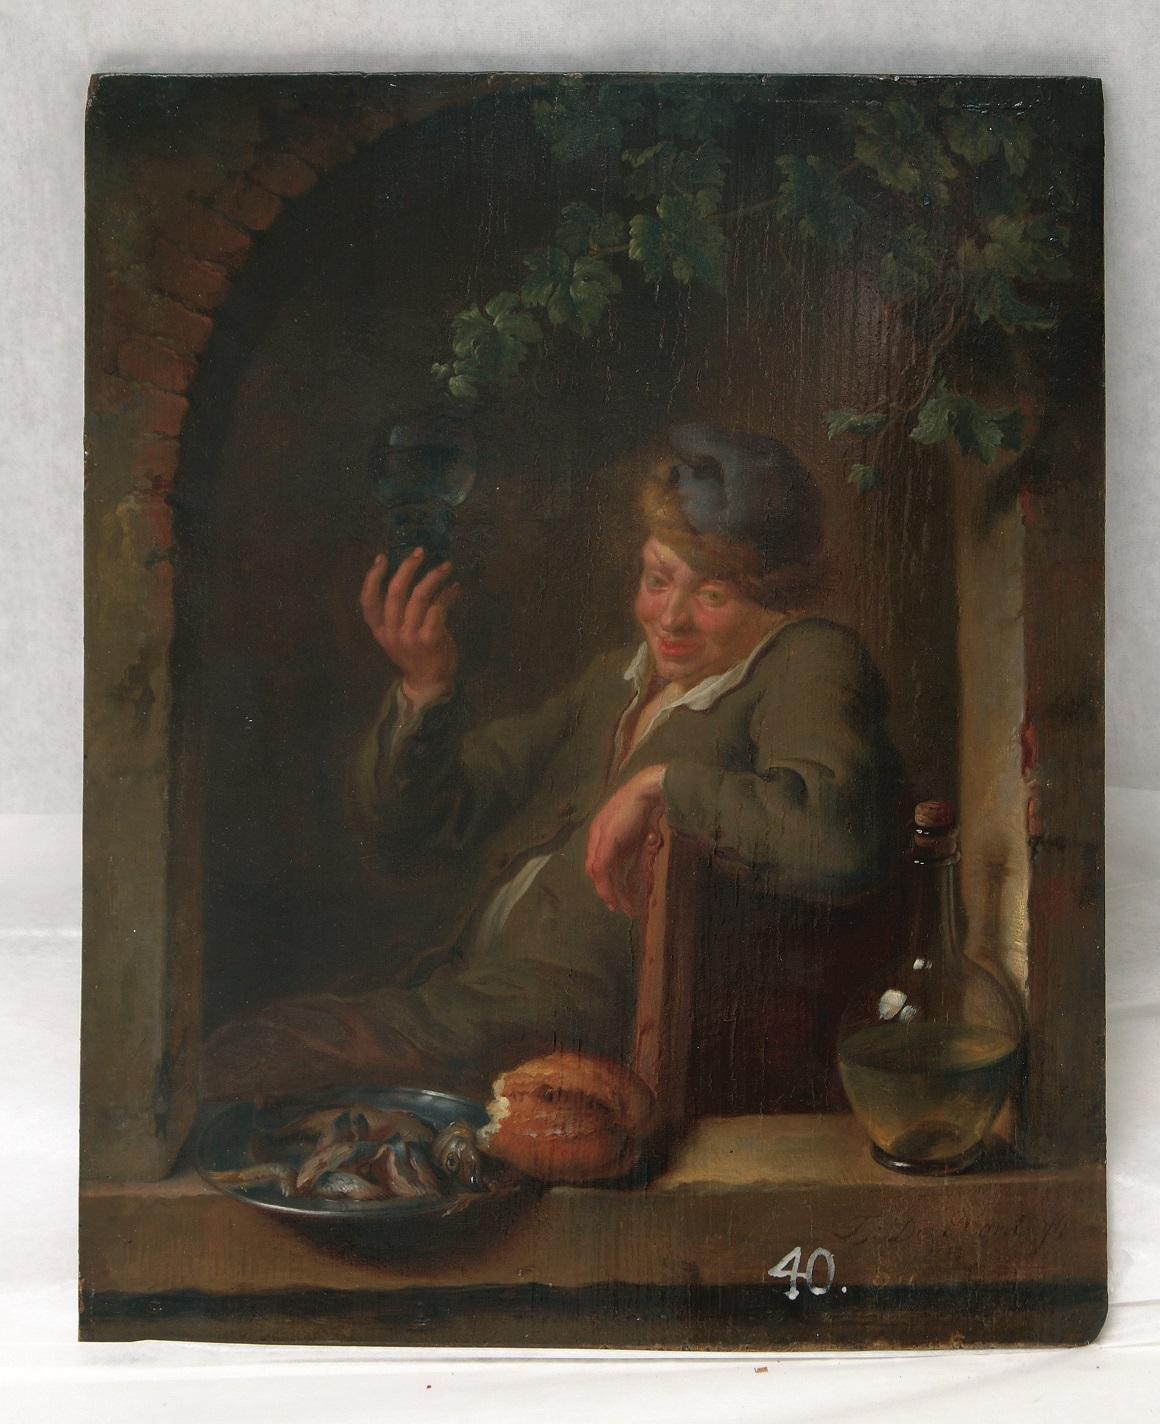 Louis de Moni (1698-1771), The Bon Vivant, oil on wood panel, 29.5 x 23.5 cm, signed and dated 174[3] Hermitage Museum, St Petersburg